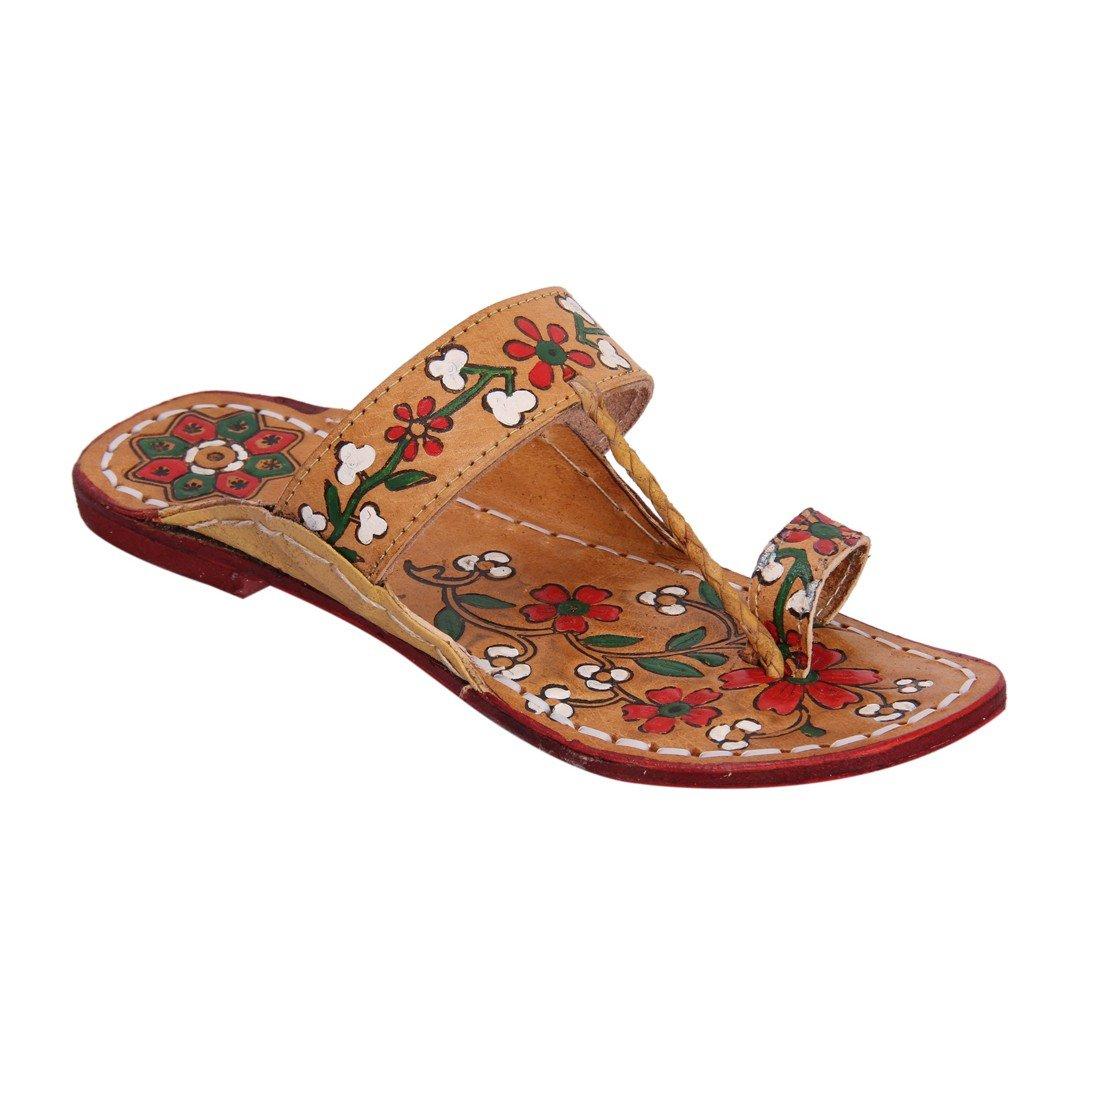 INDCROWN Hippie Indian Water Buffalo Jesus Sandle 100% Leather Kolhapuri Flat Flower Print Woman Sandle B07F79XKRP 10 B(M) US Red